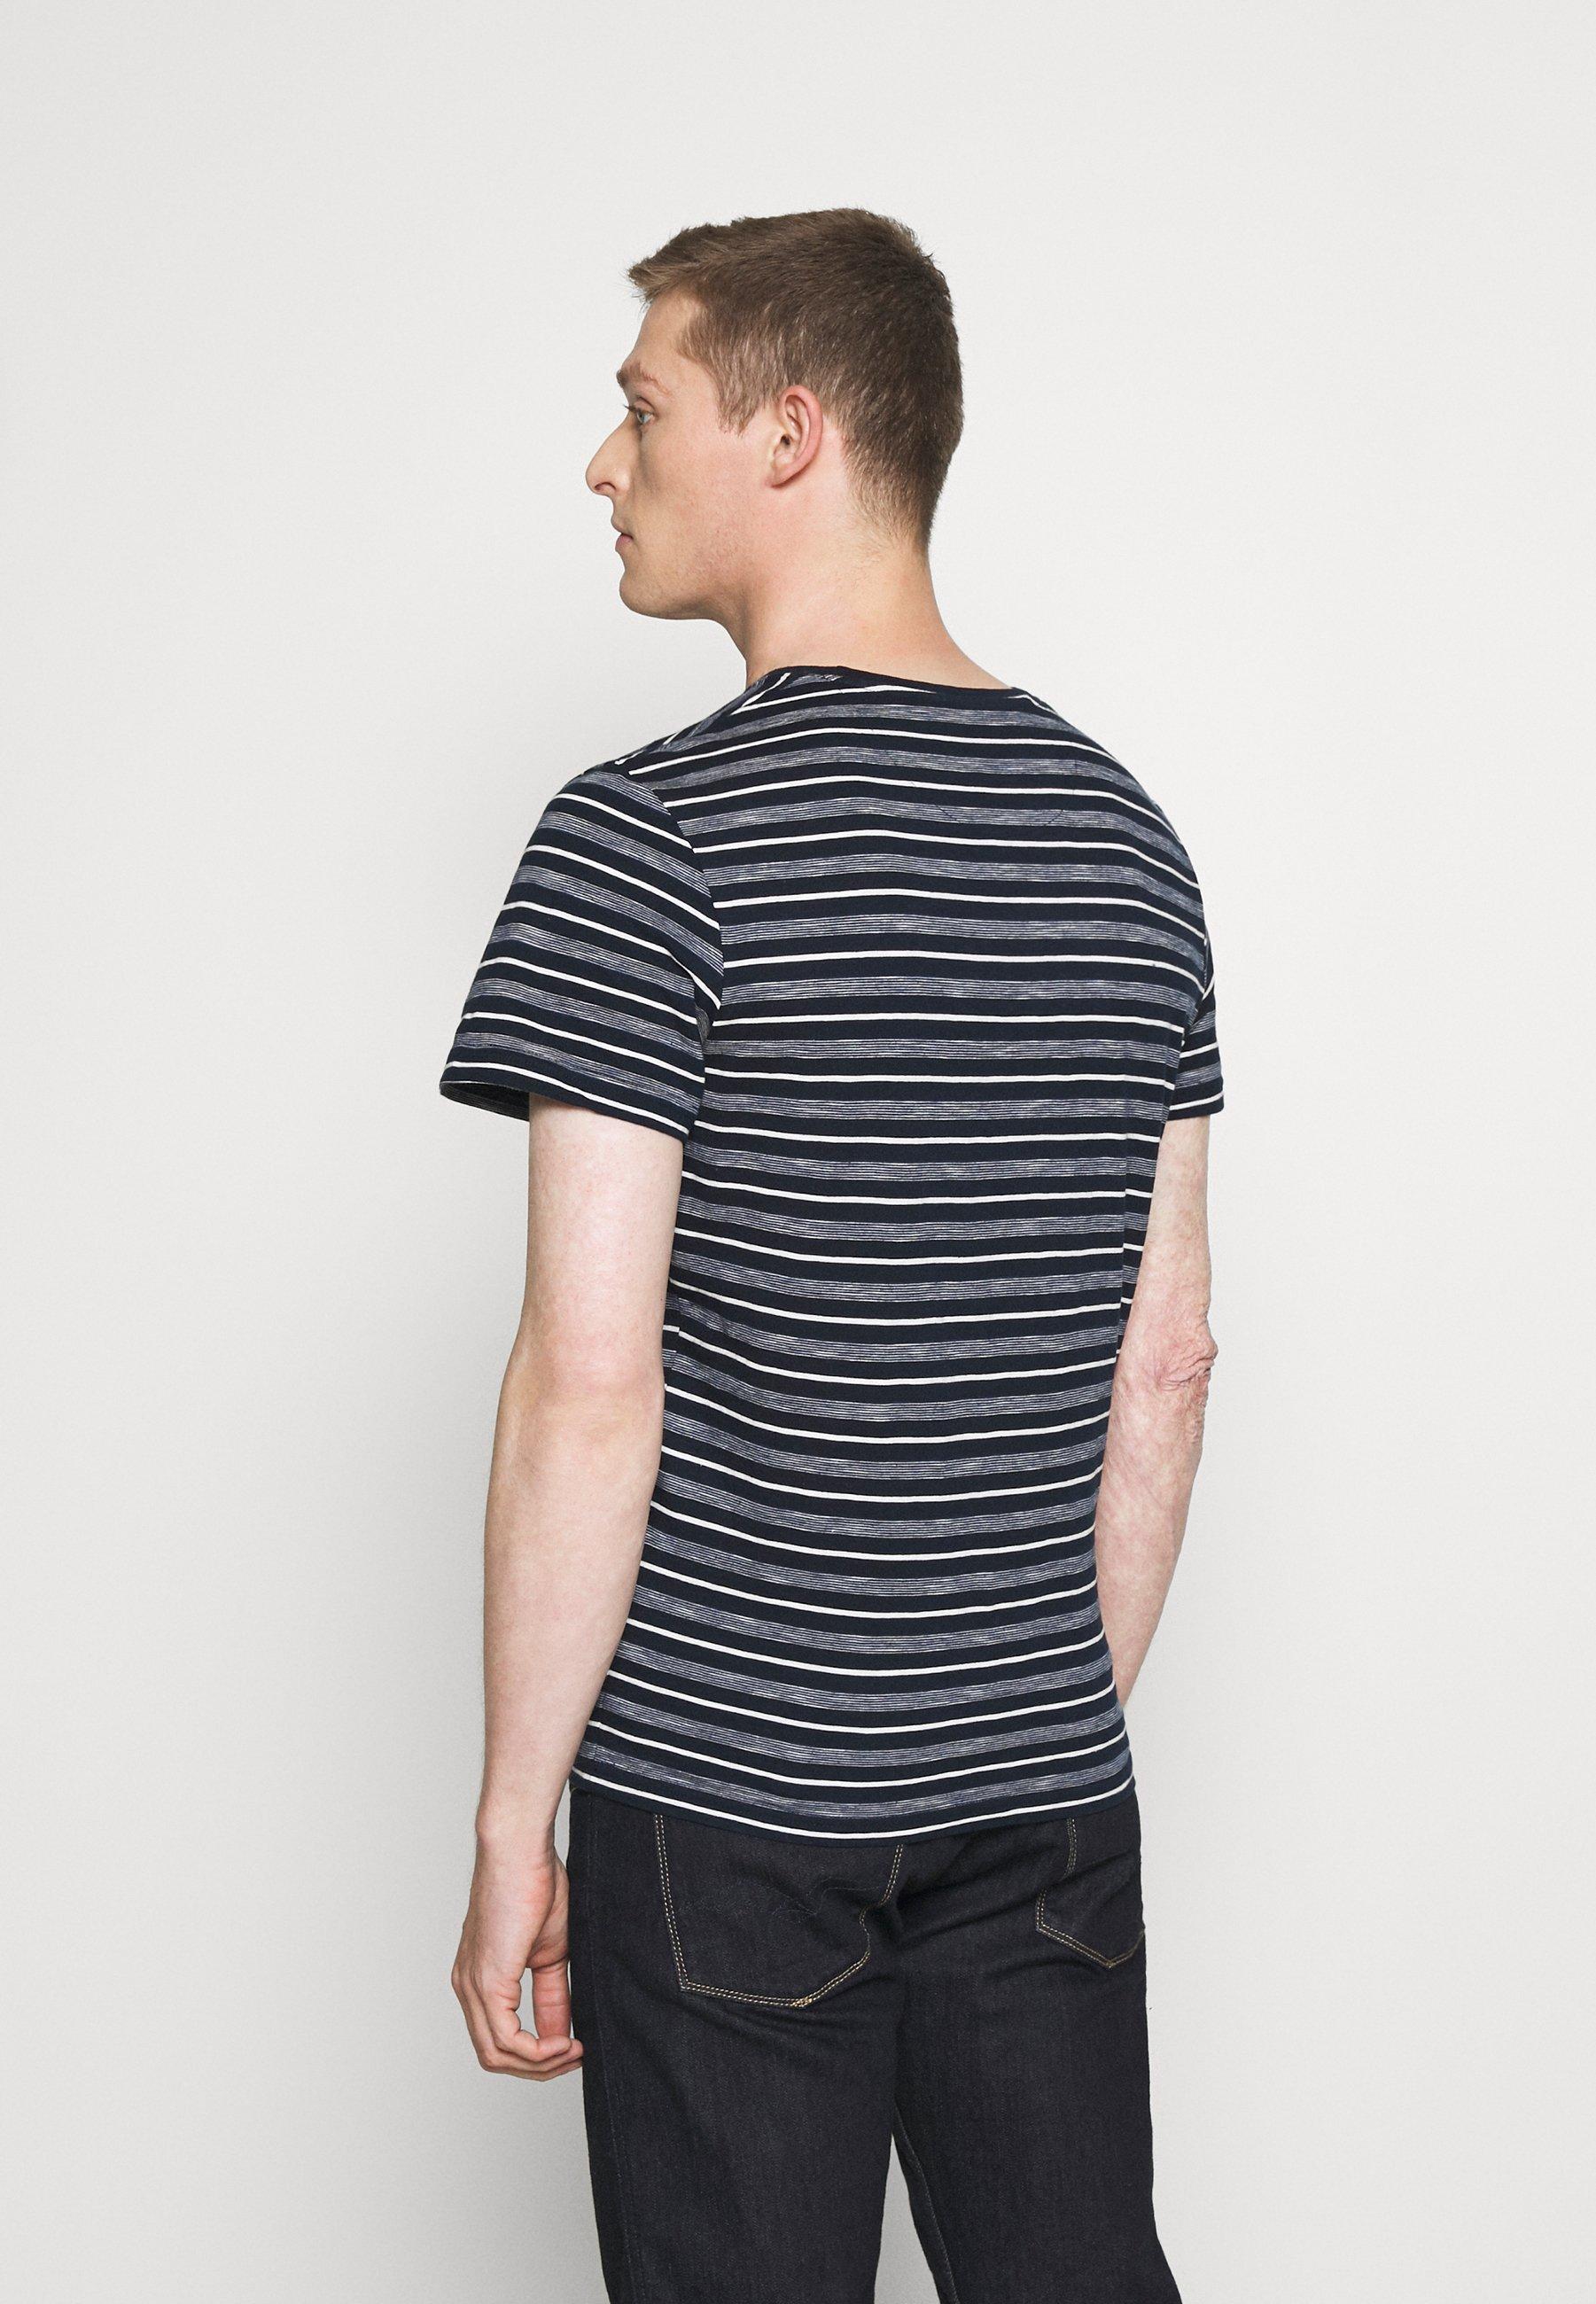 TOM TAILOR STRIPED  - Print T-shirt - blue/off white AYLq5